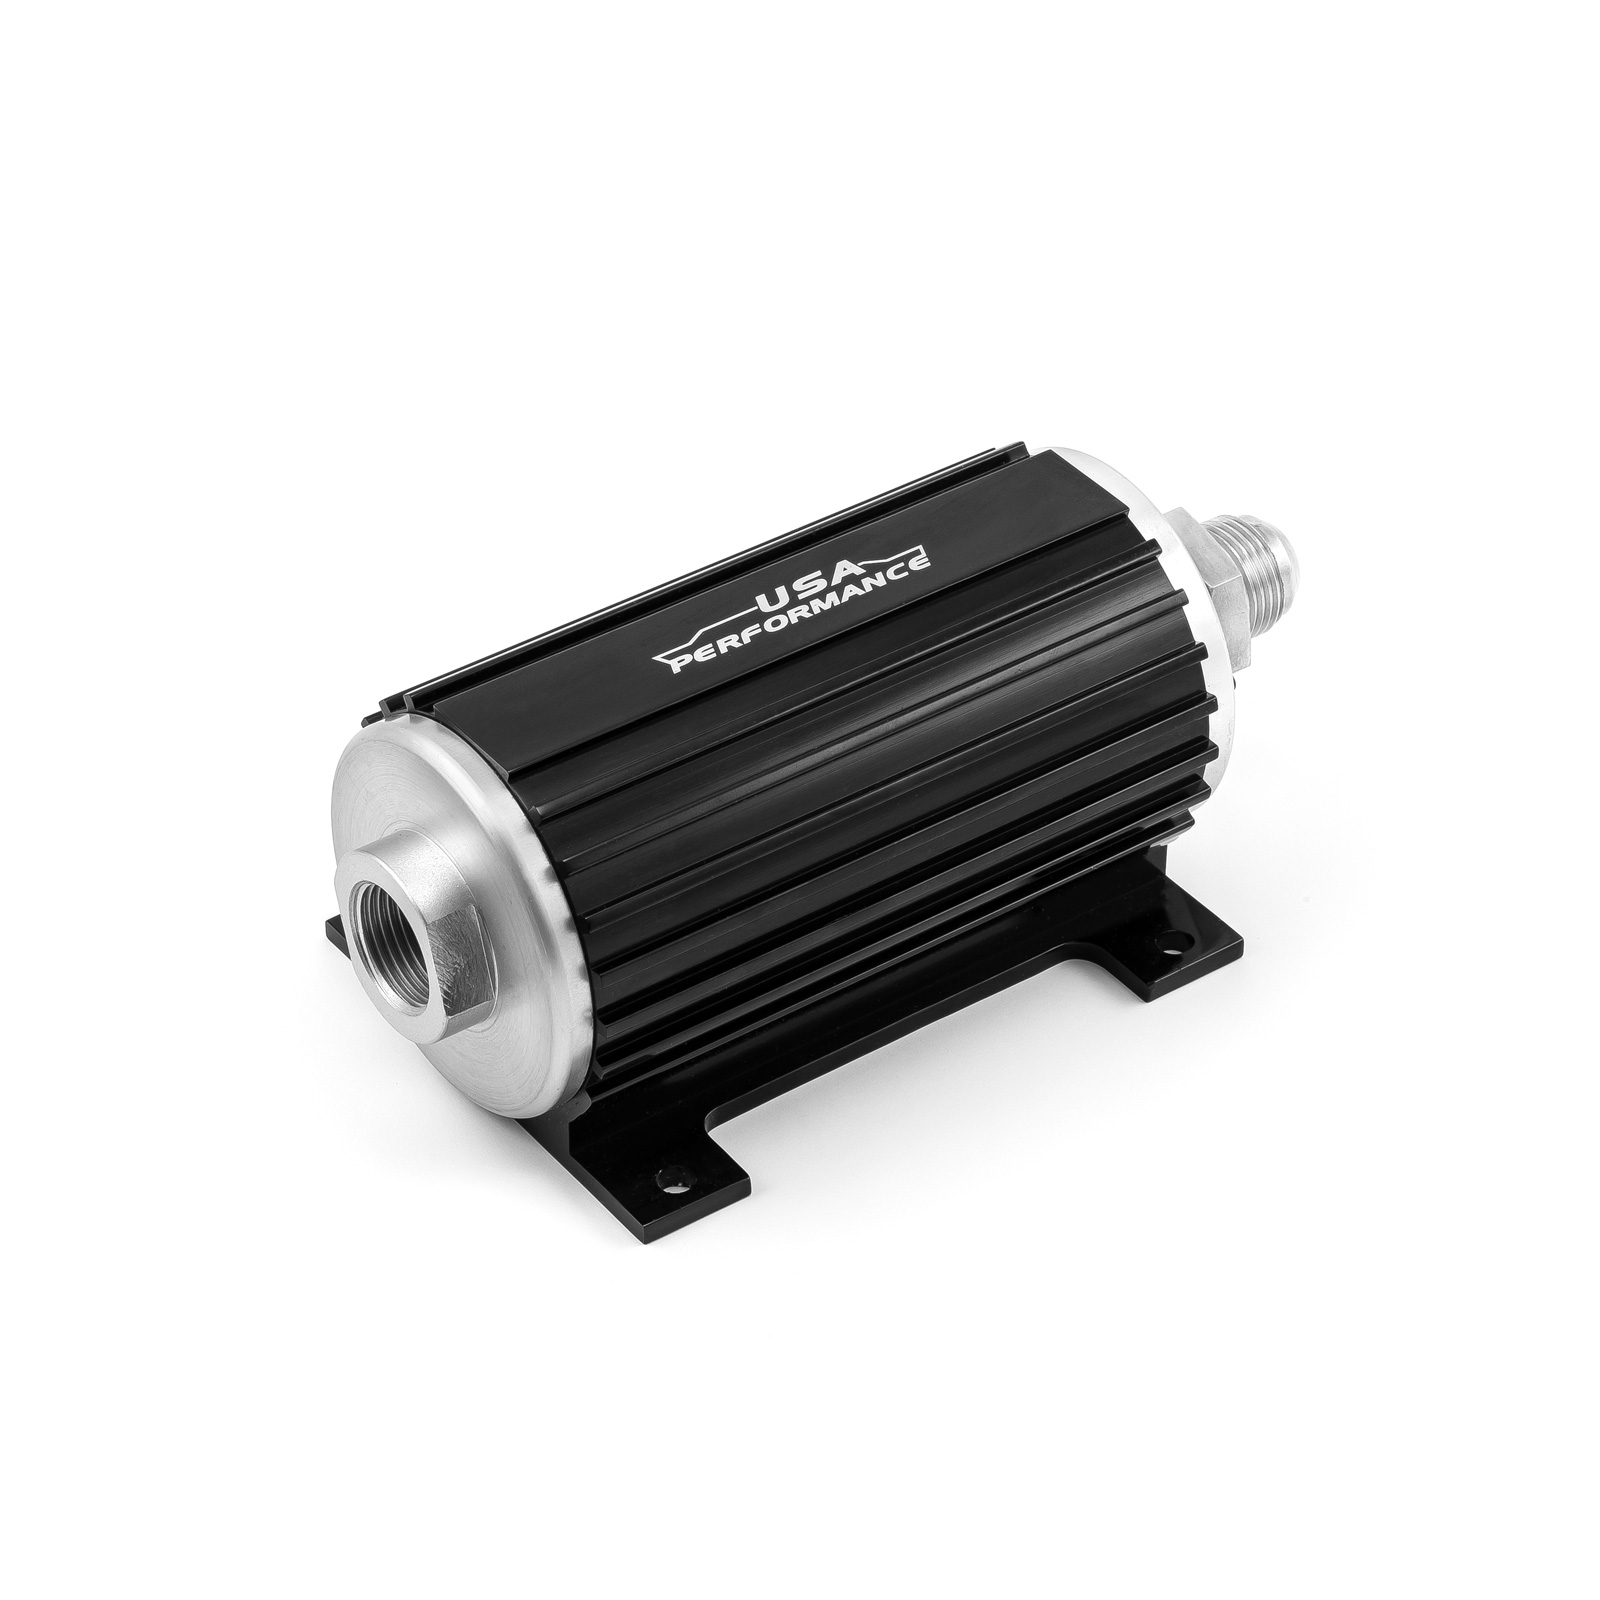 1000 Lbs./Hr. Inline External Universal EFI Electric Fuel Pump